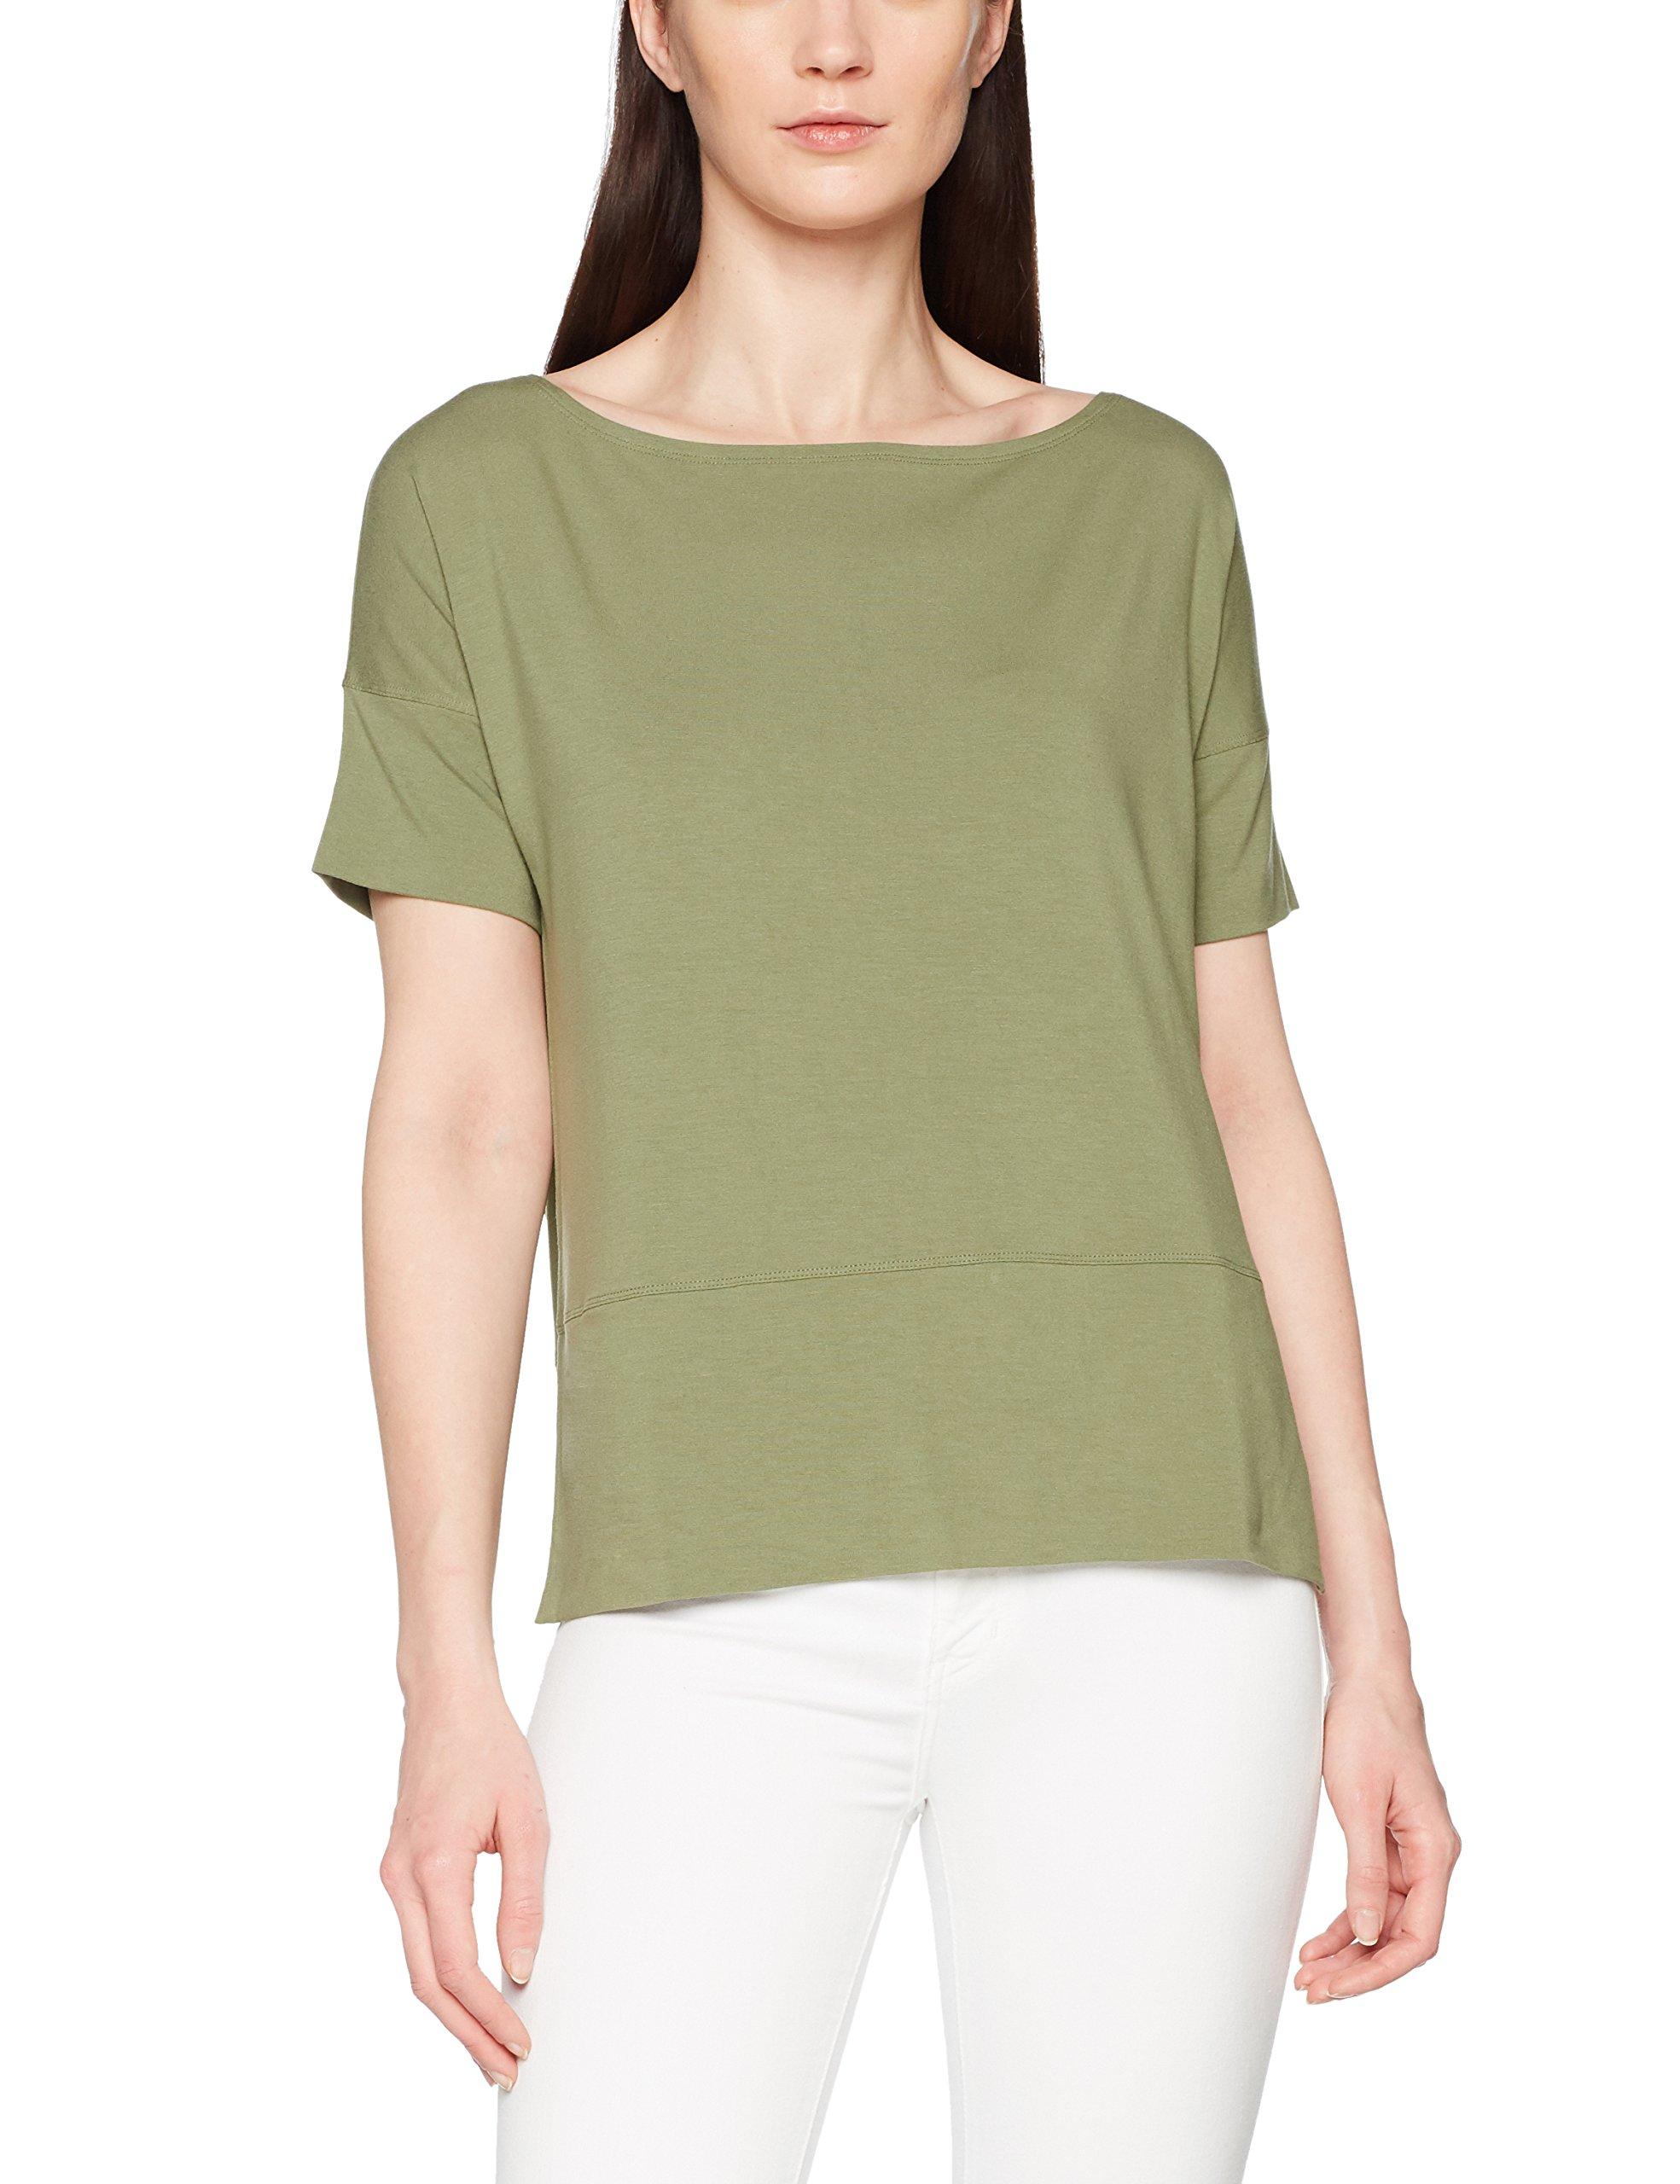 Aileen T Green Blaumax 766038taille FabricantSFemme shirtVertdusky EDe9WIbH2Y